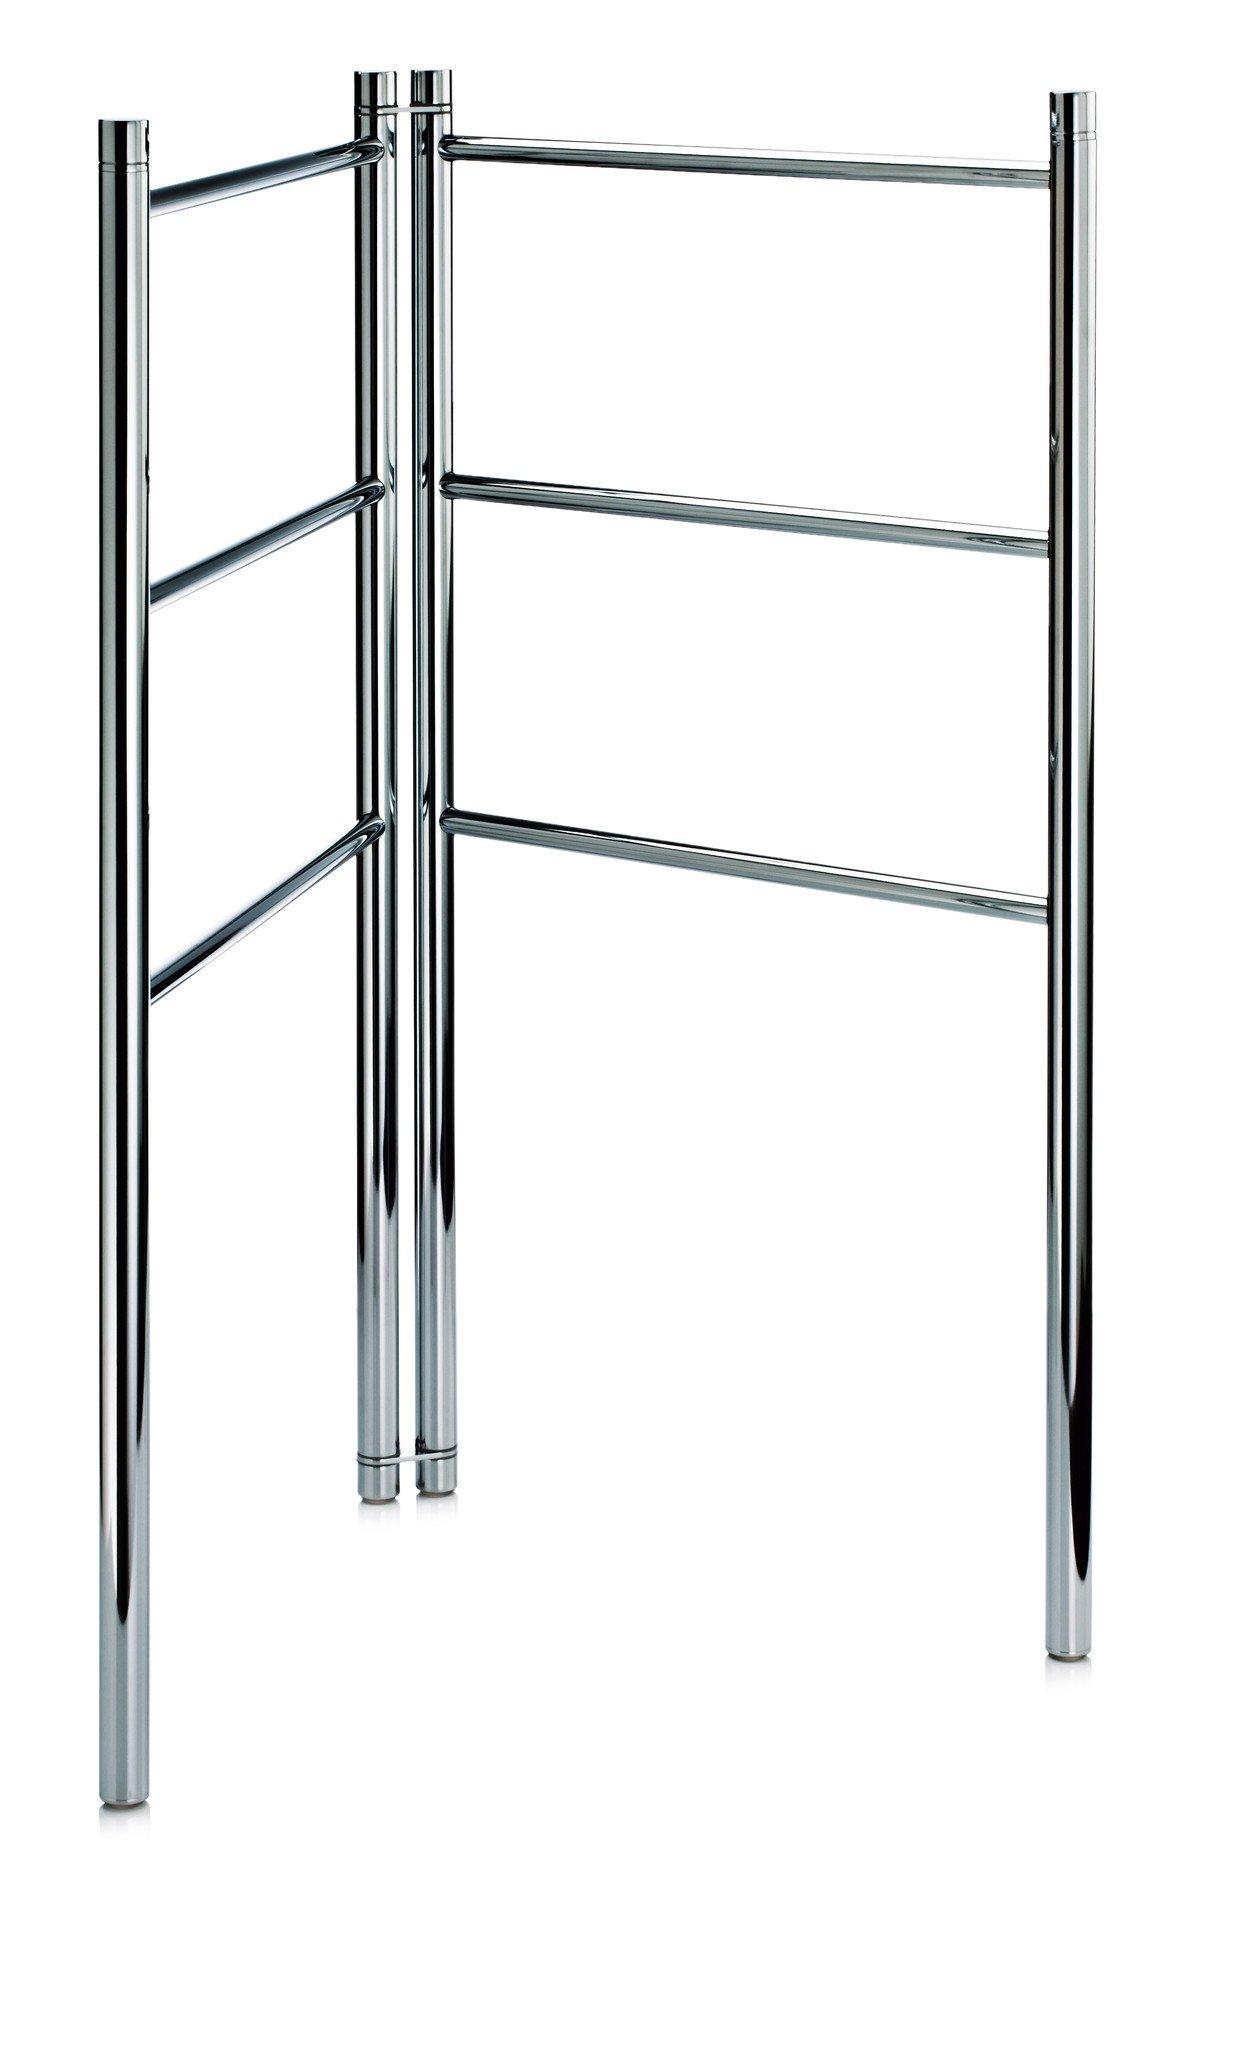 DWBA Standing Towel Ladder Bathroom Rack Stand Towel Holder, Foldable. Chrome